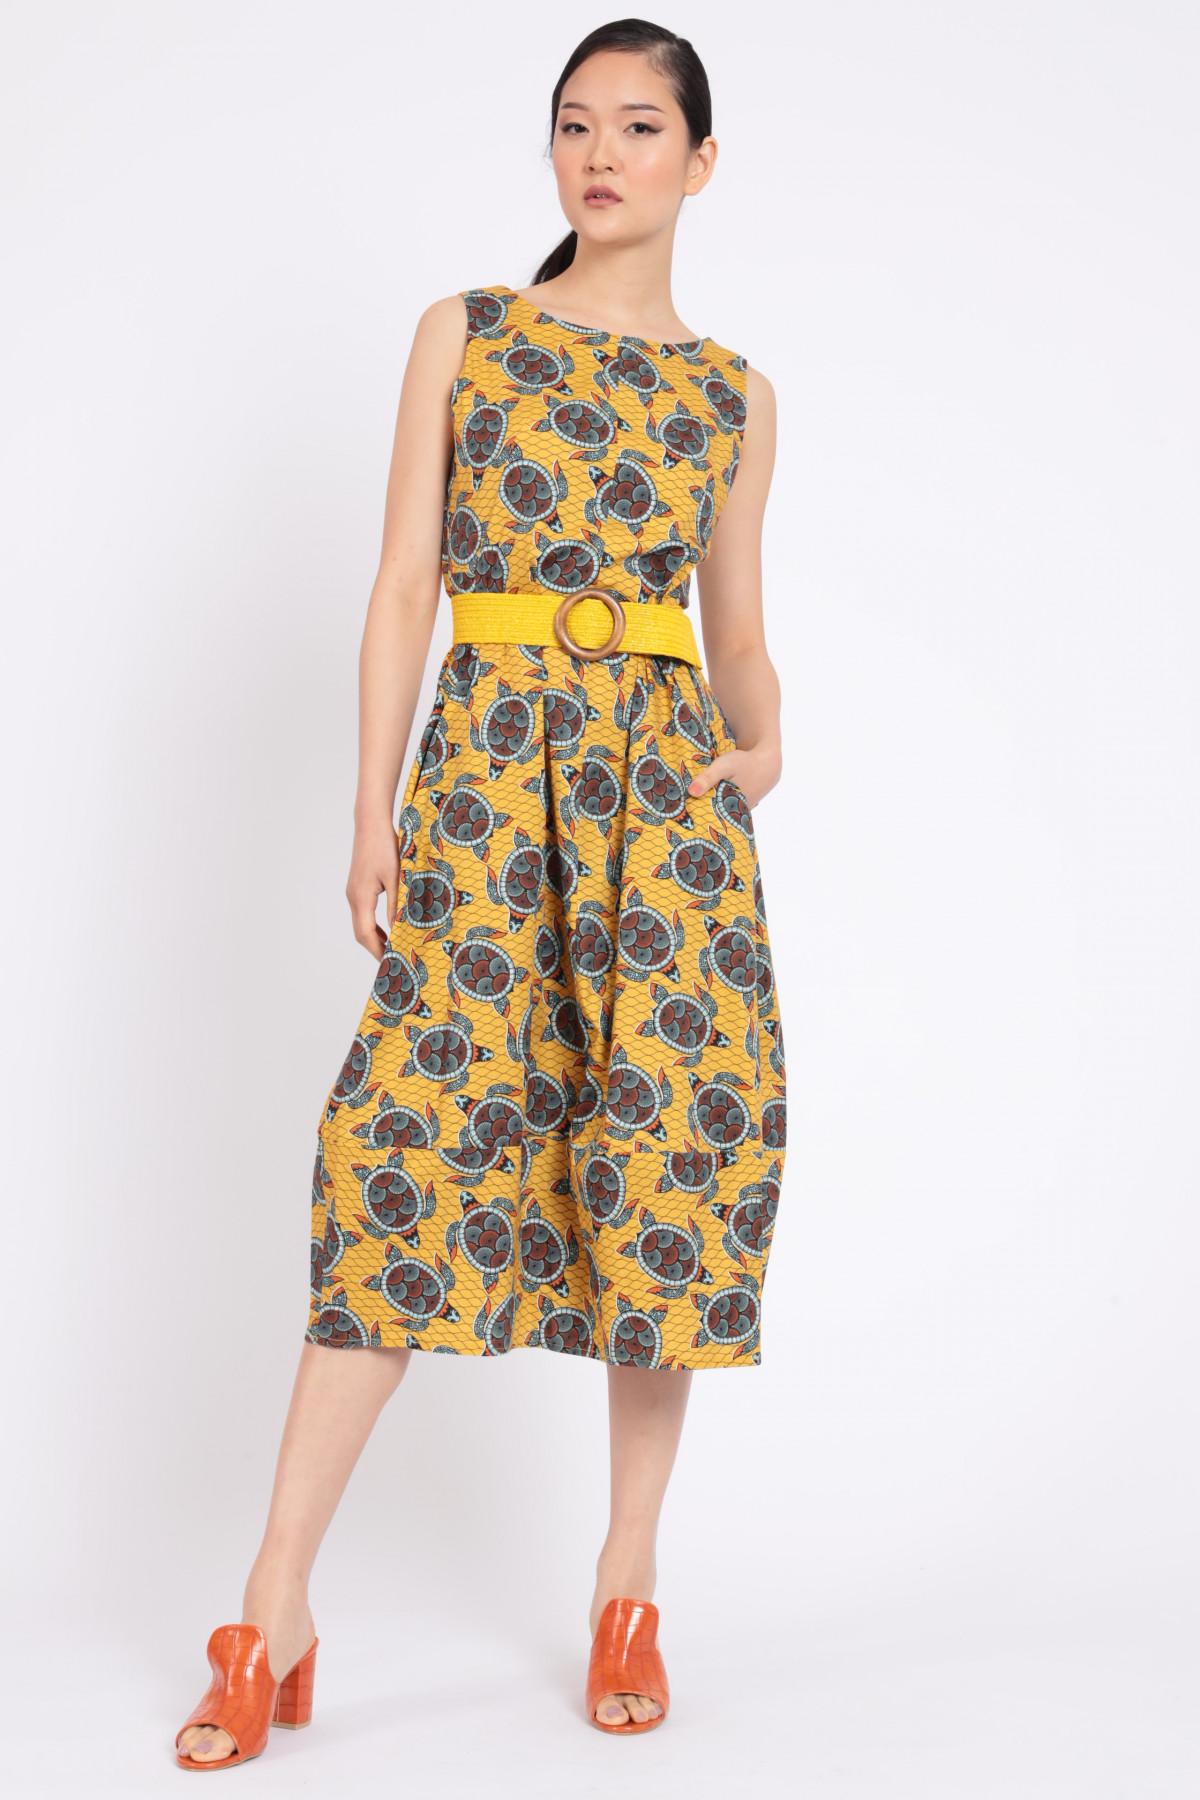 Sleeveless Dress in Afro Print Fantasy